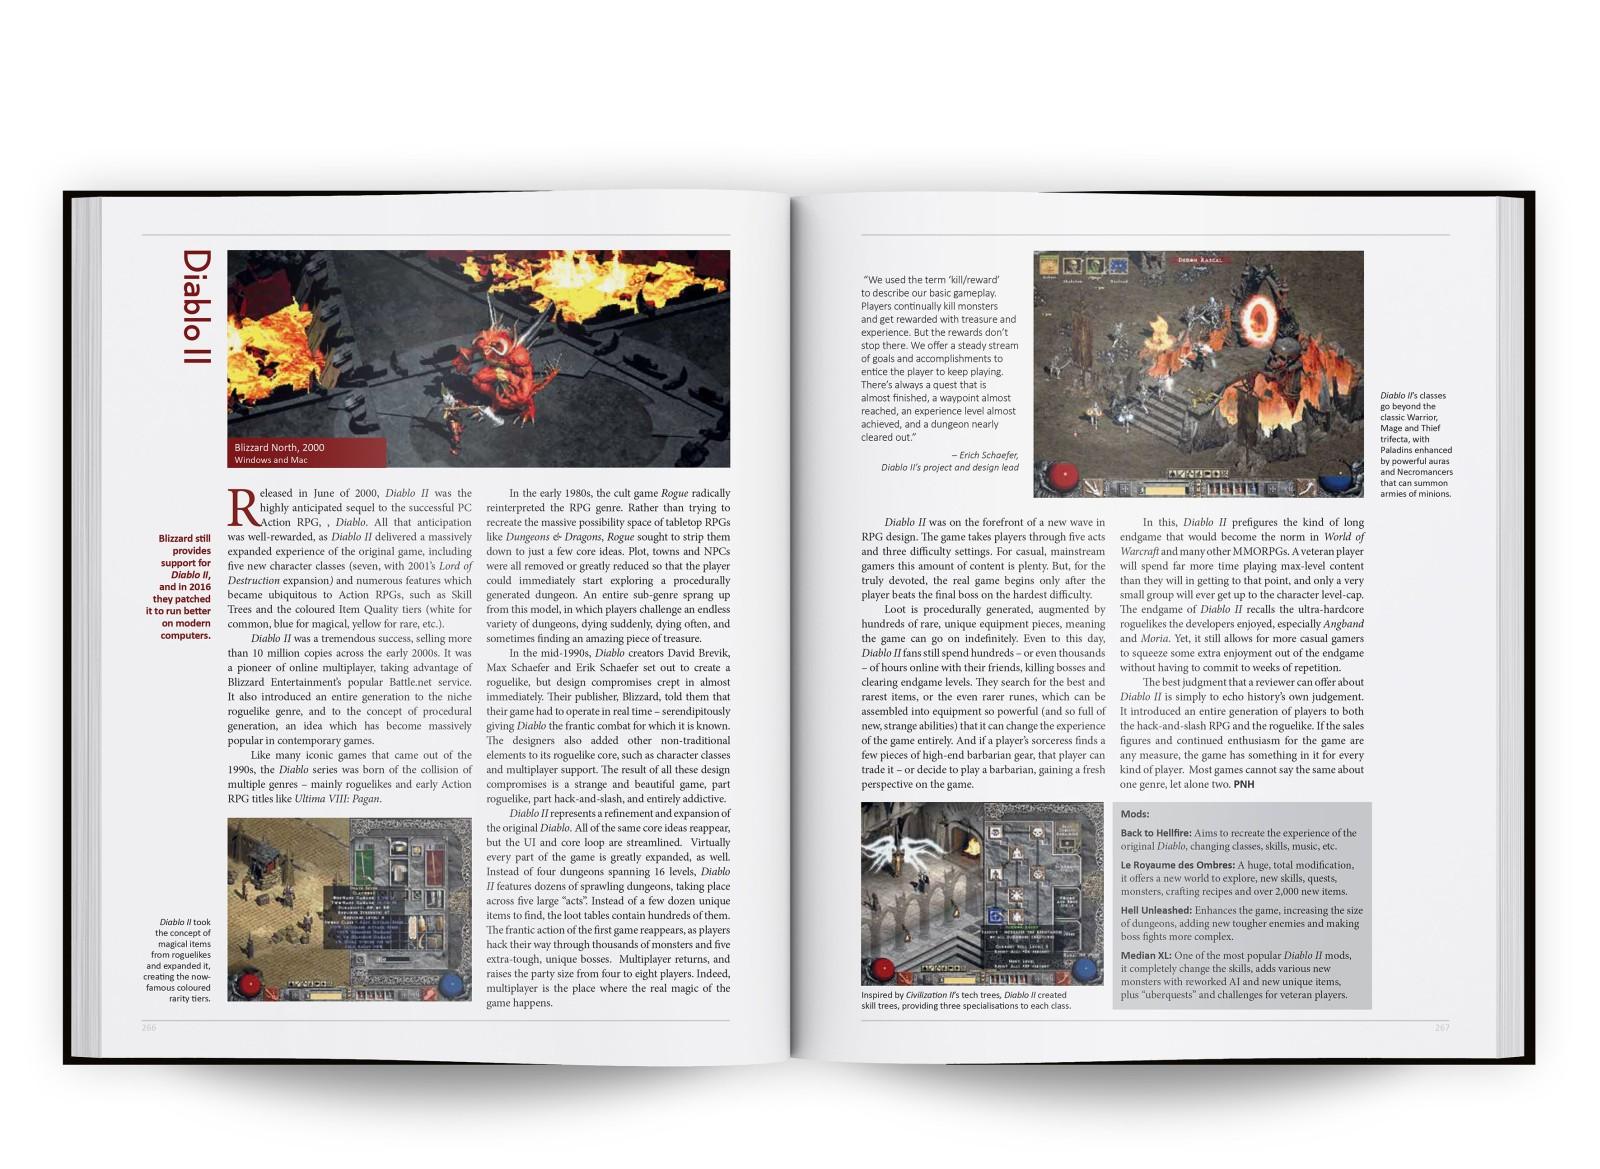 Image du livre The CRPG Book.